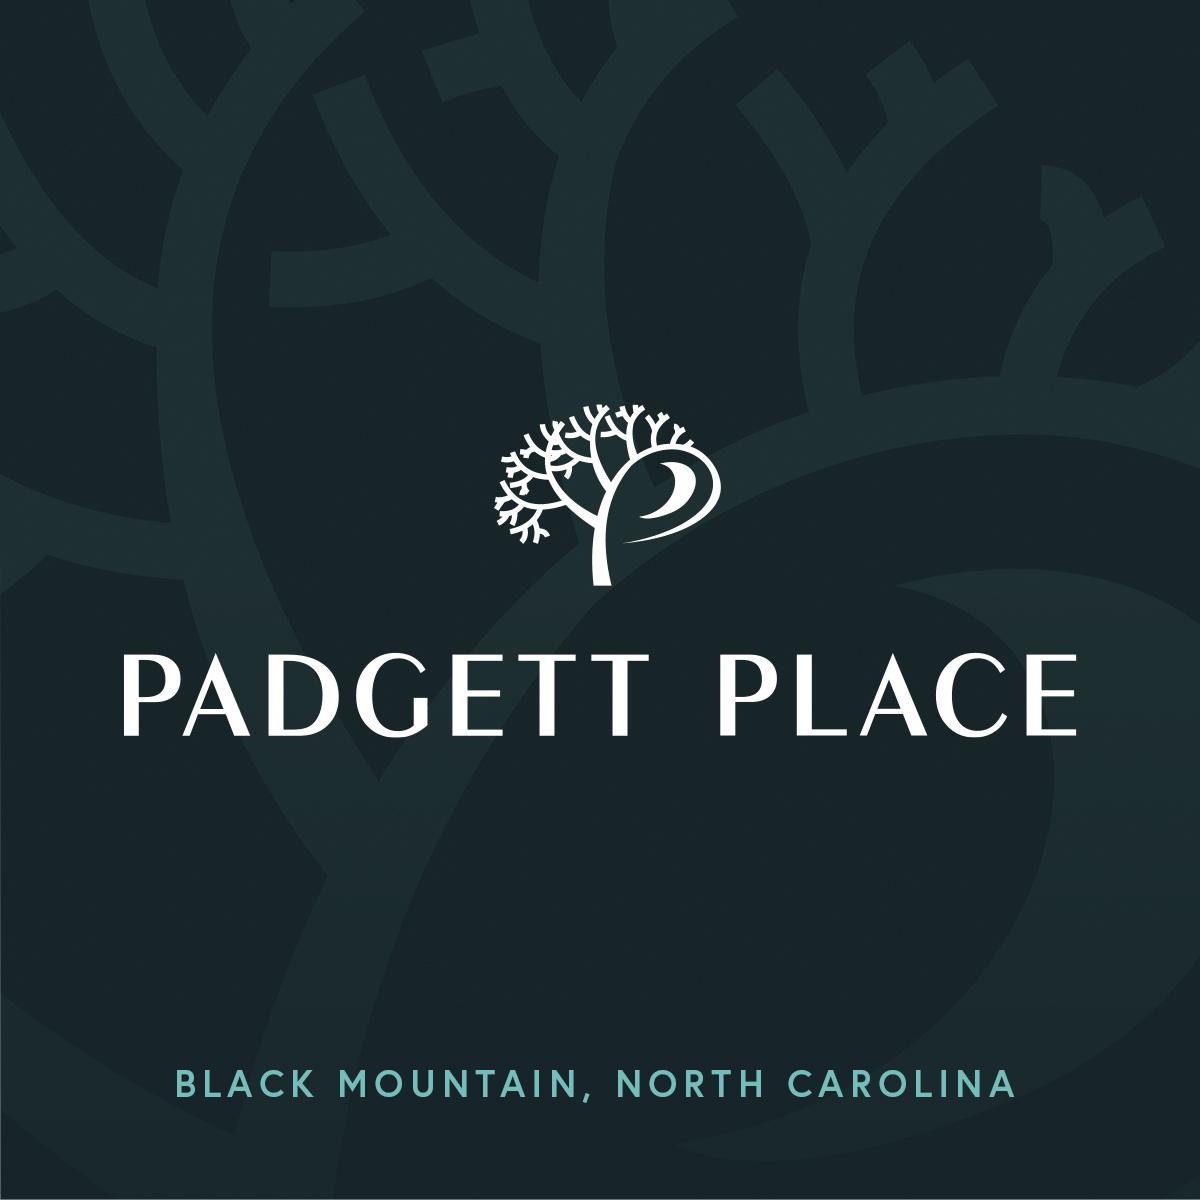 Padgett Place